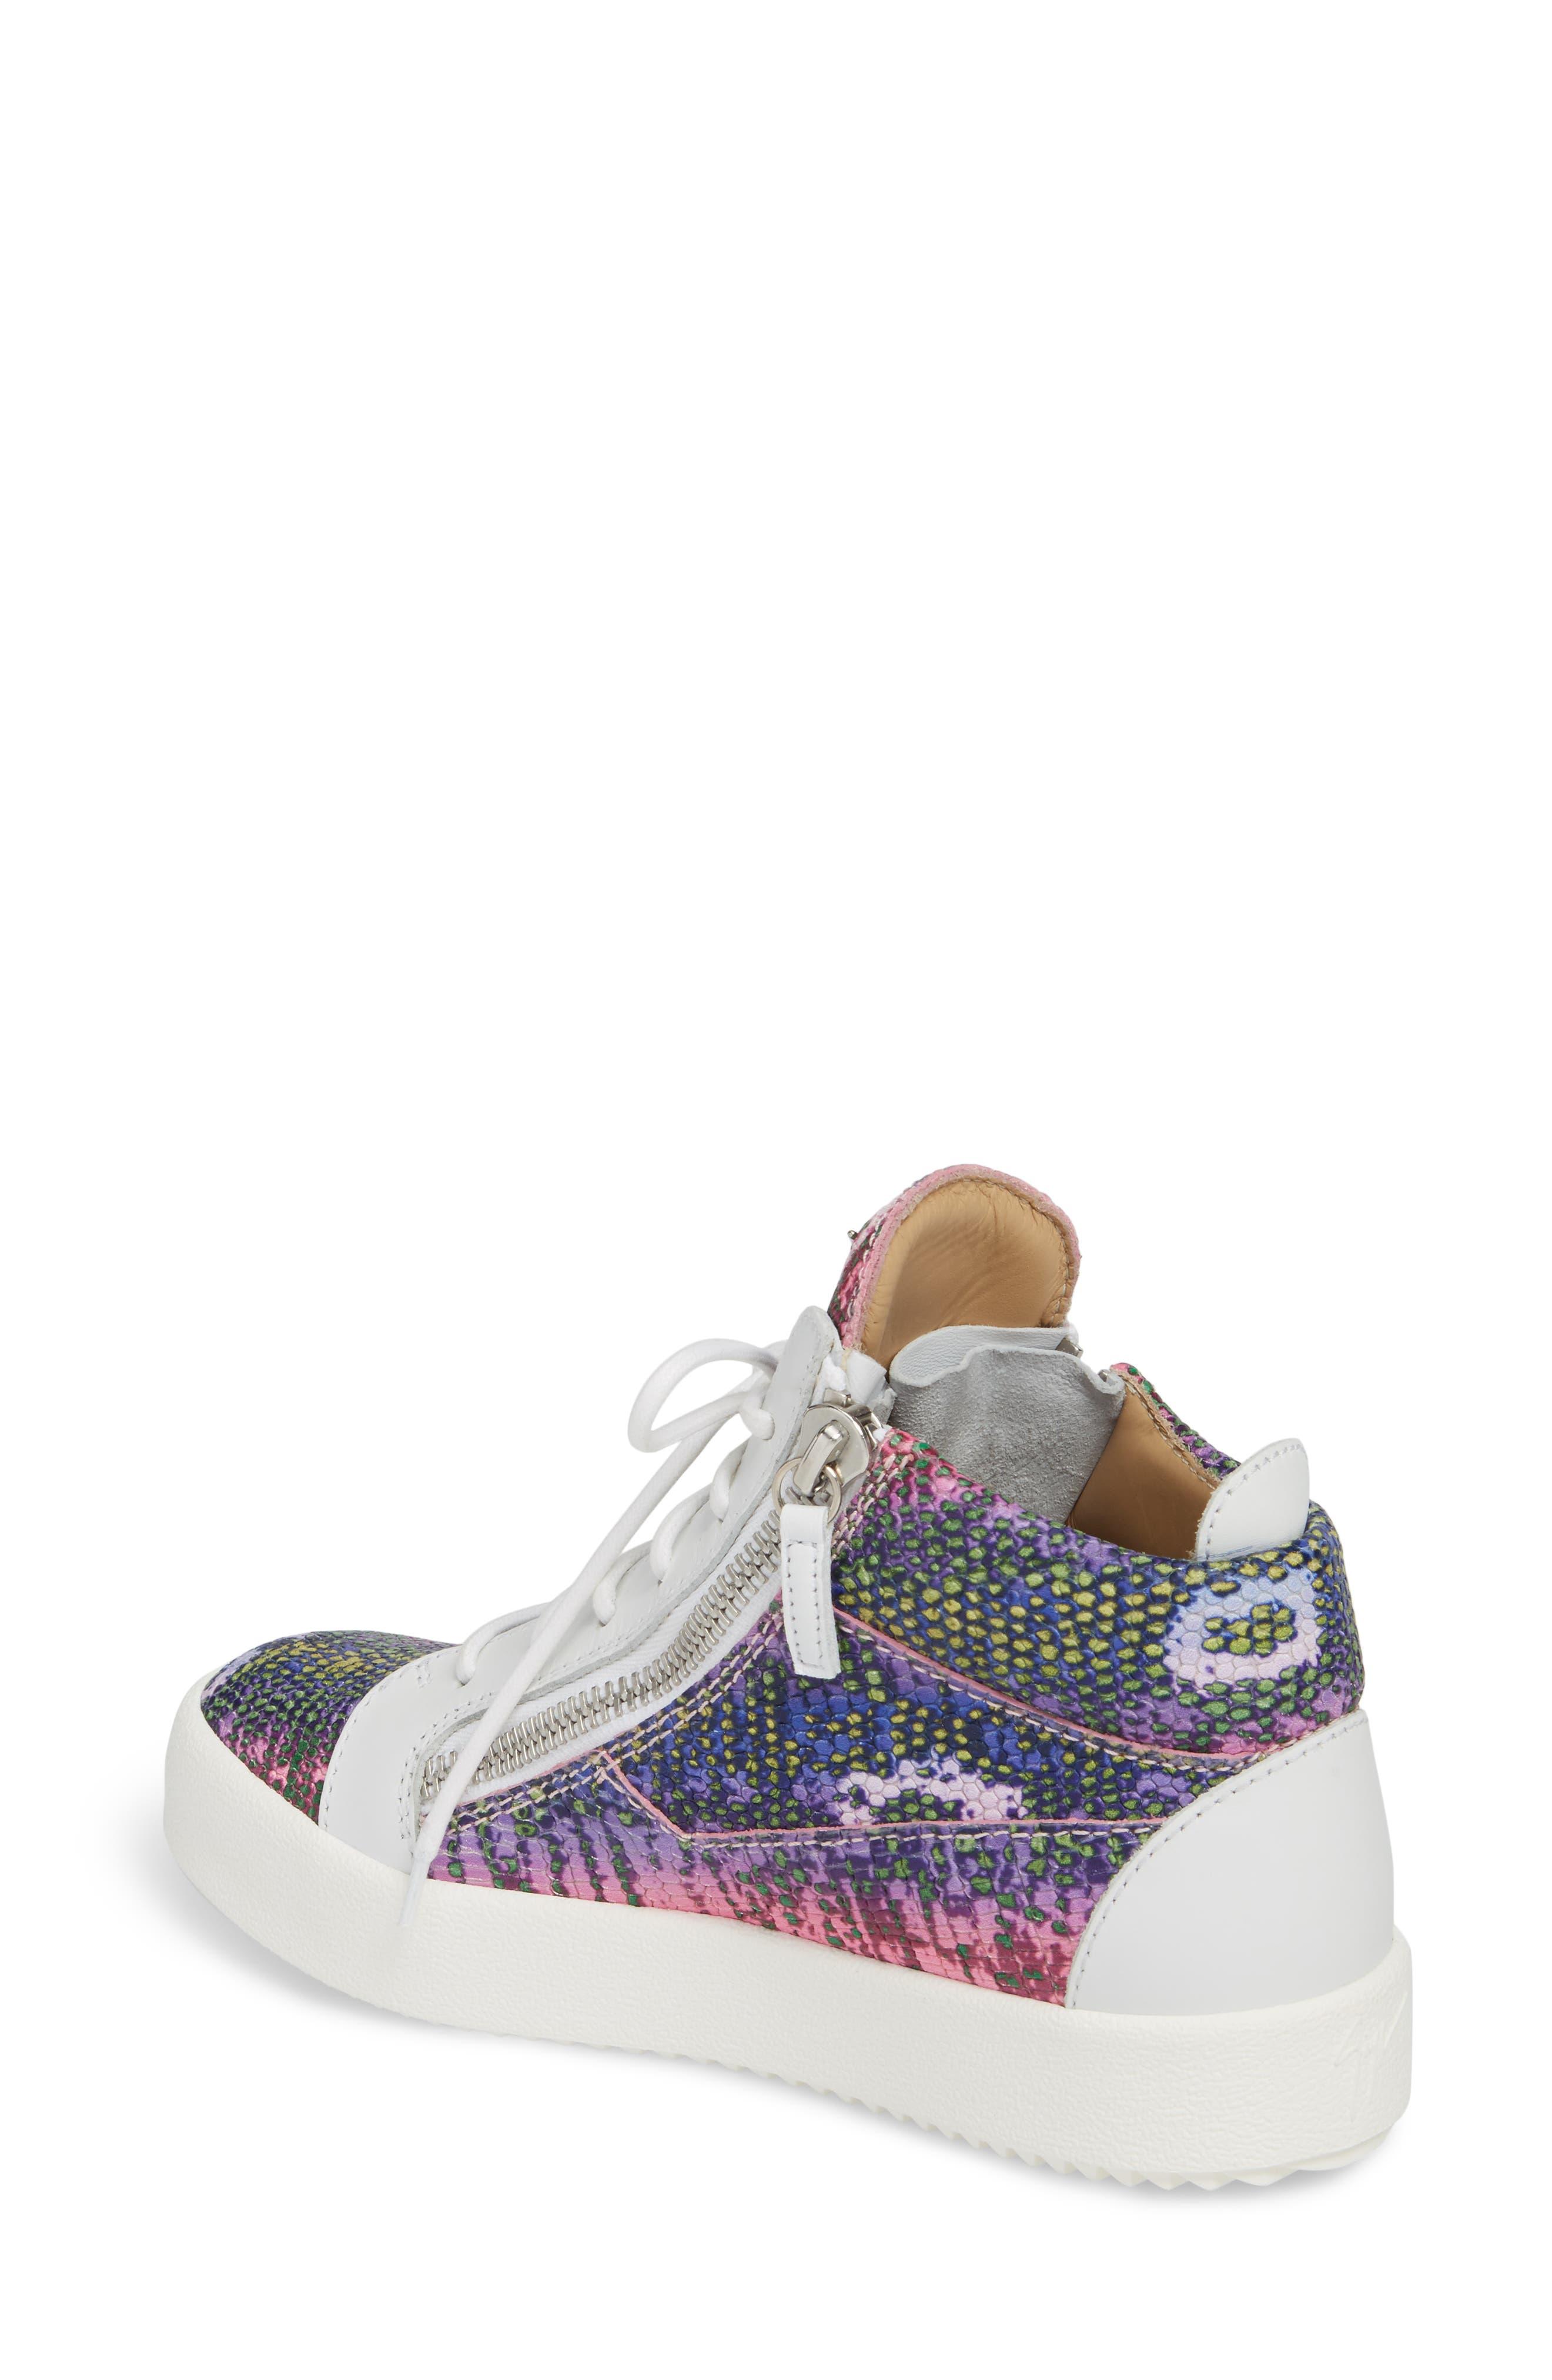 May London Mid Top Sneaker,                             Alternate thumbnail 2, color,                             PINK MULTI